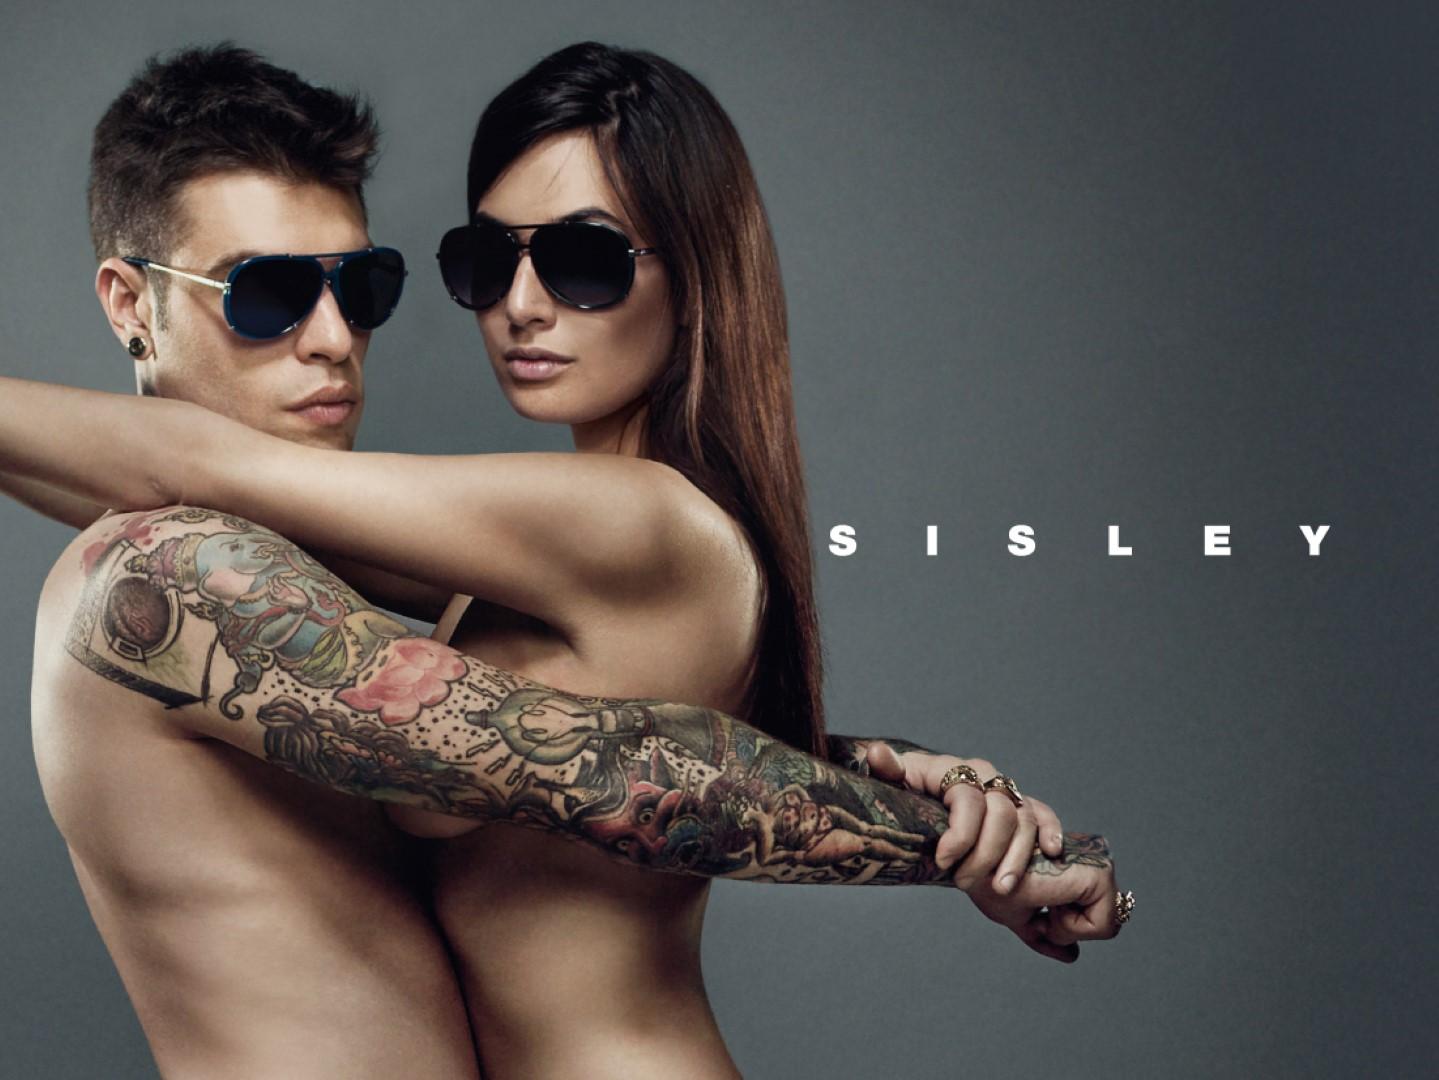 Sisley occhiali primavera estate 2015